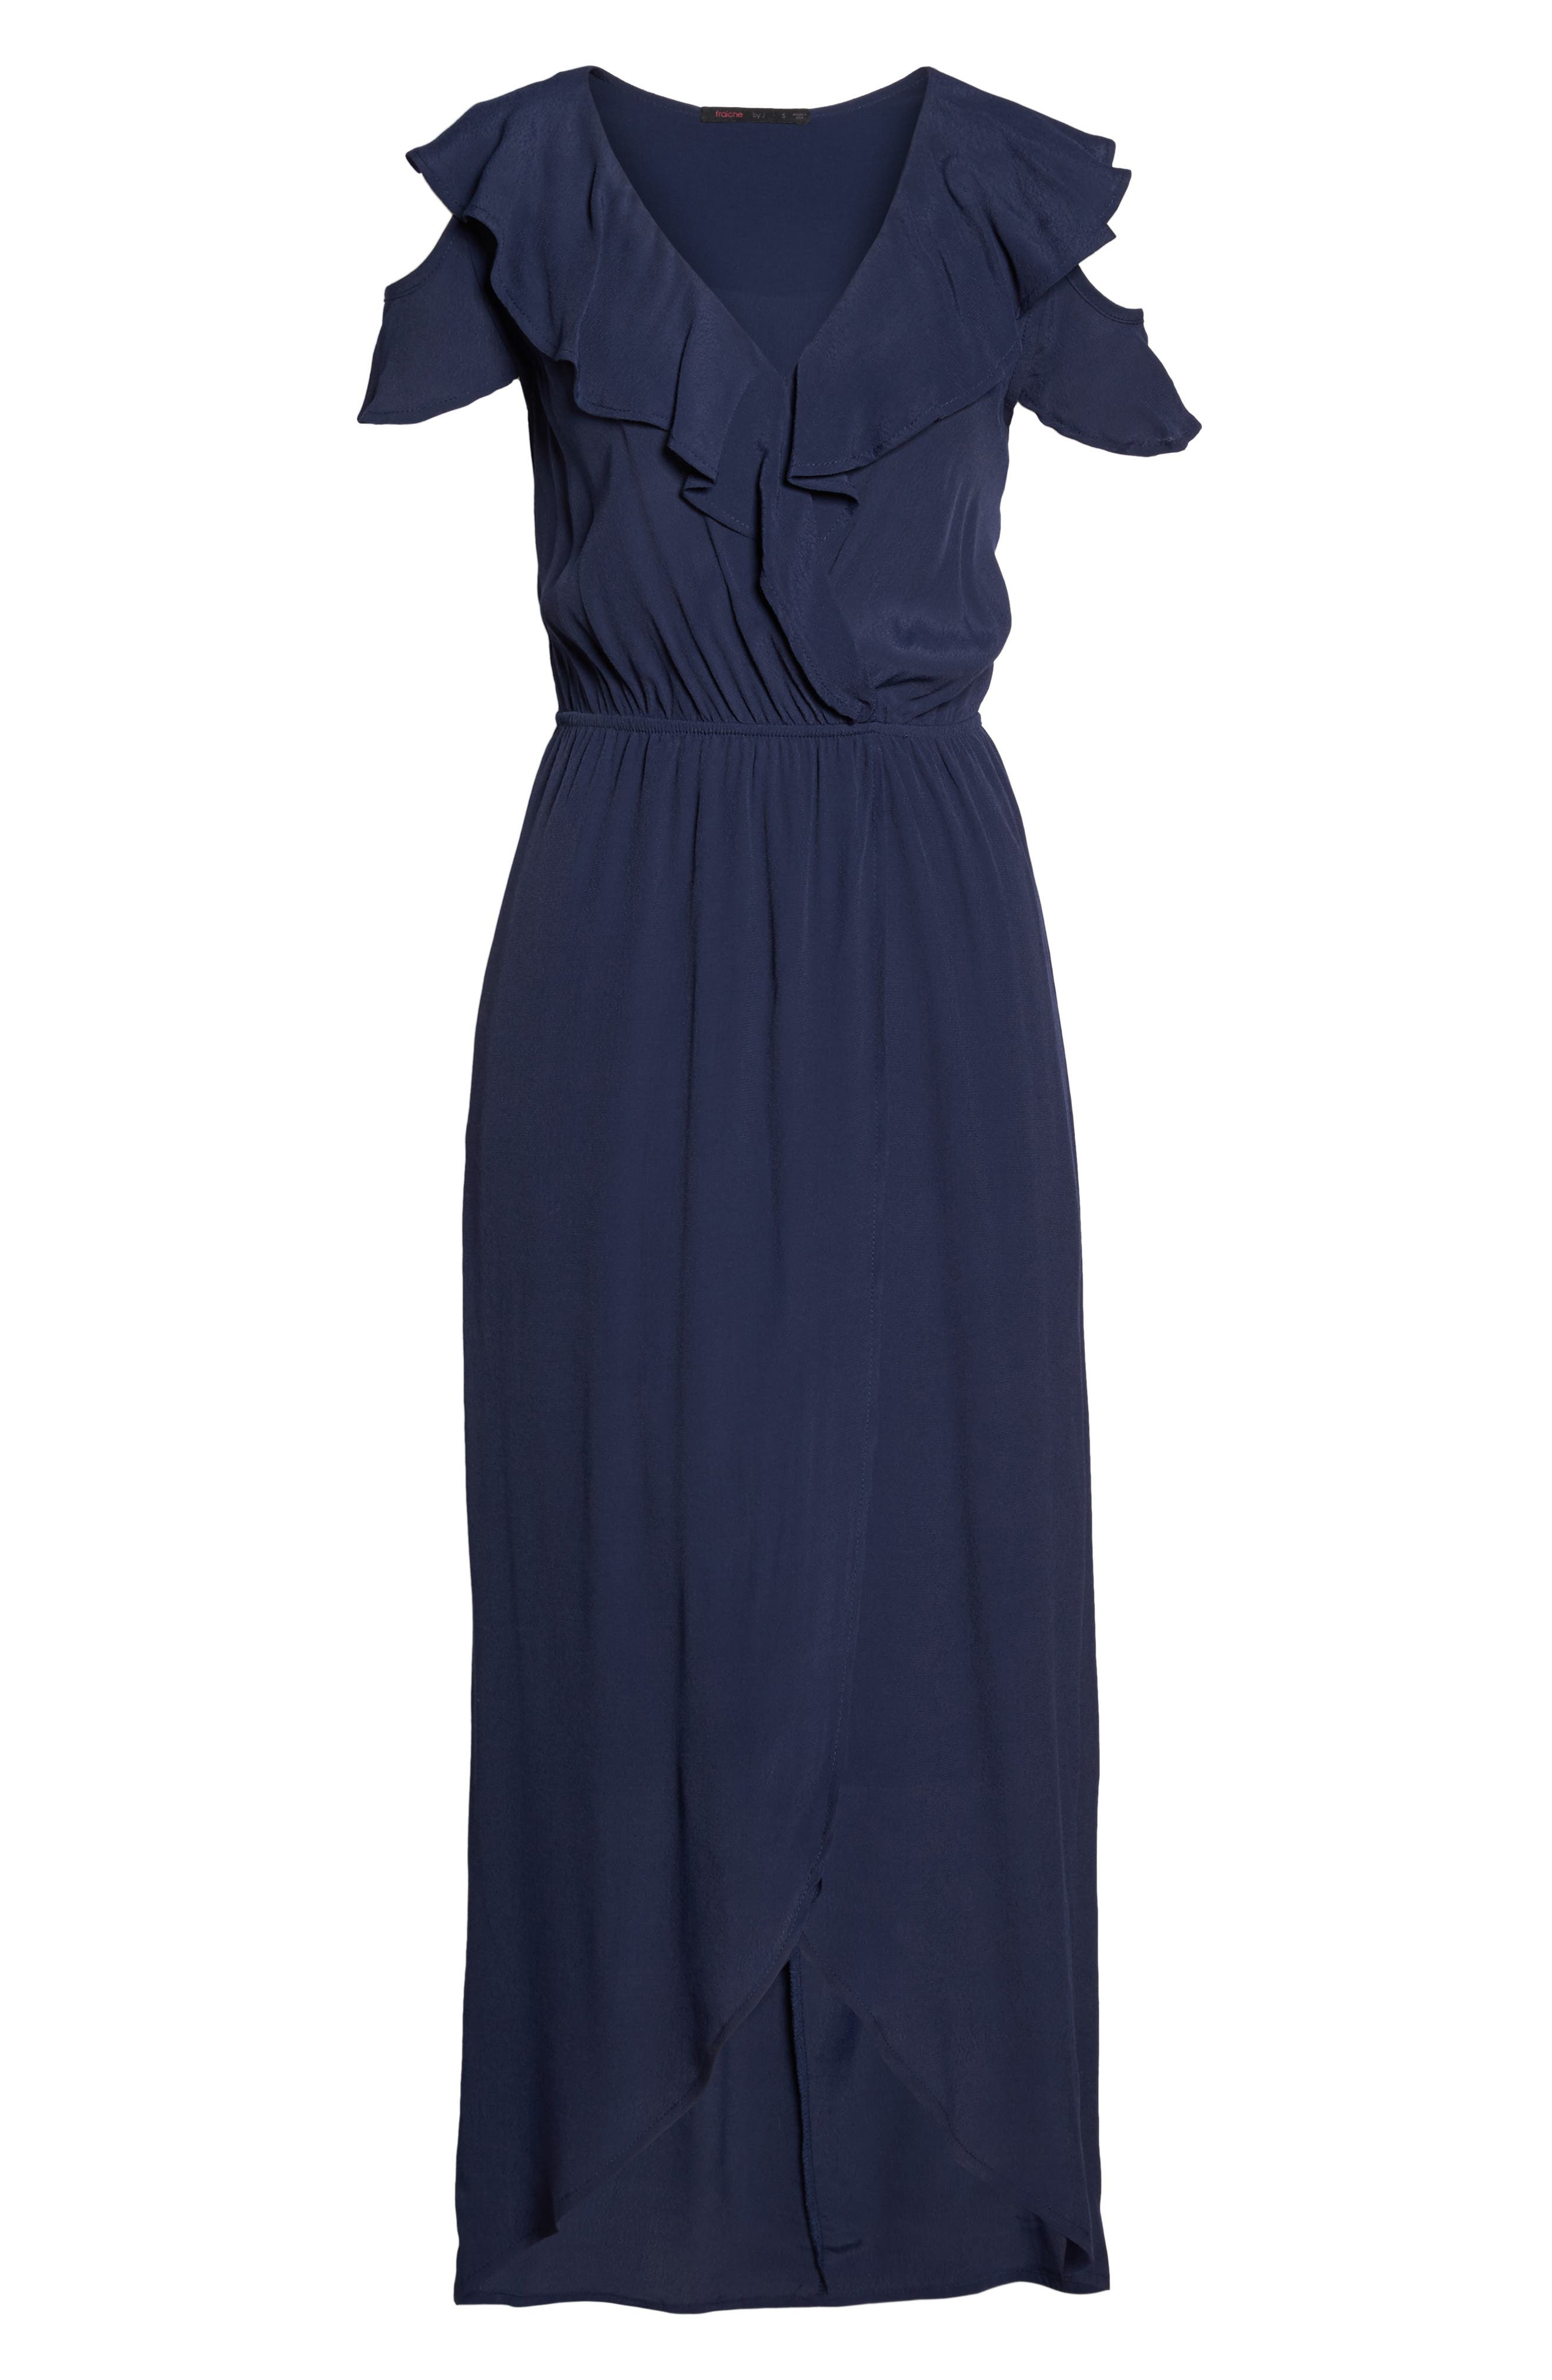 FRAICHE BY J, Cold Shoulder Maxi Dress, Alternate thumbnail 6, color, NAVY